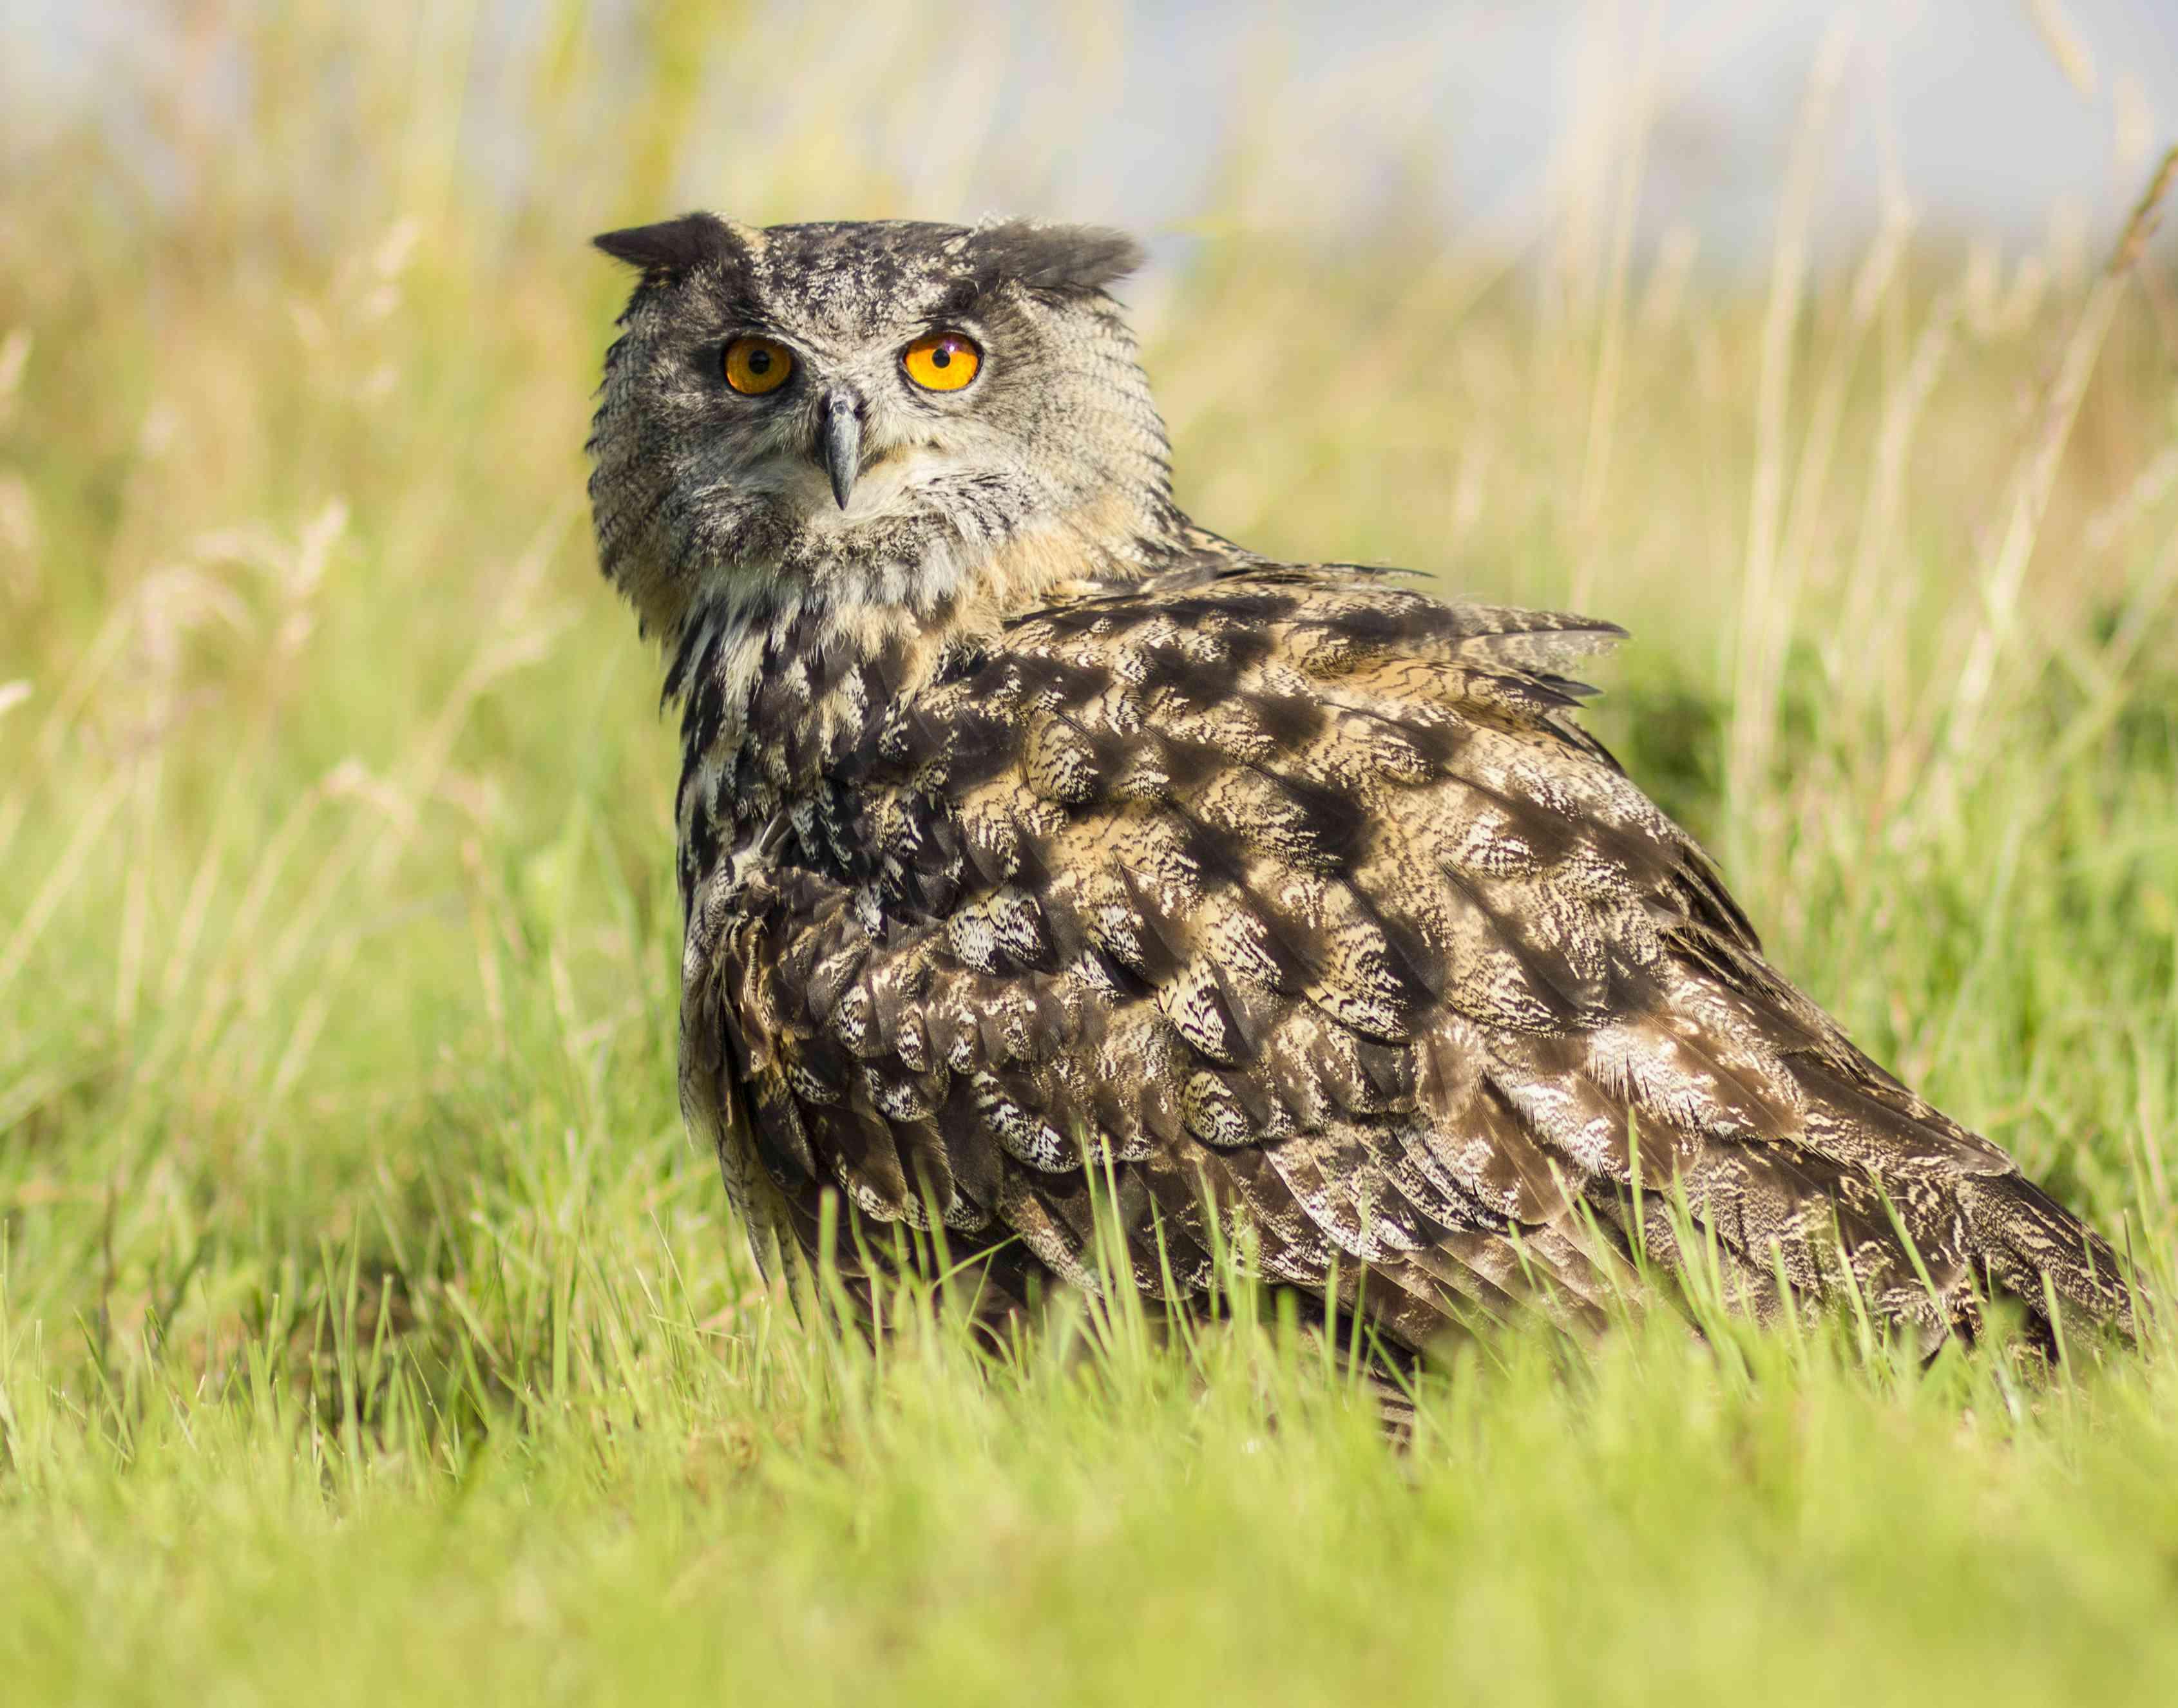 Eurasian eagle owl in tall grass